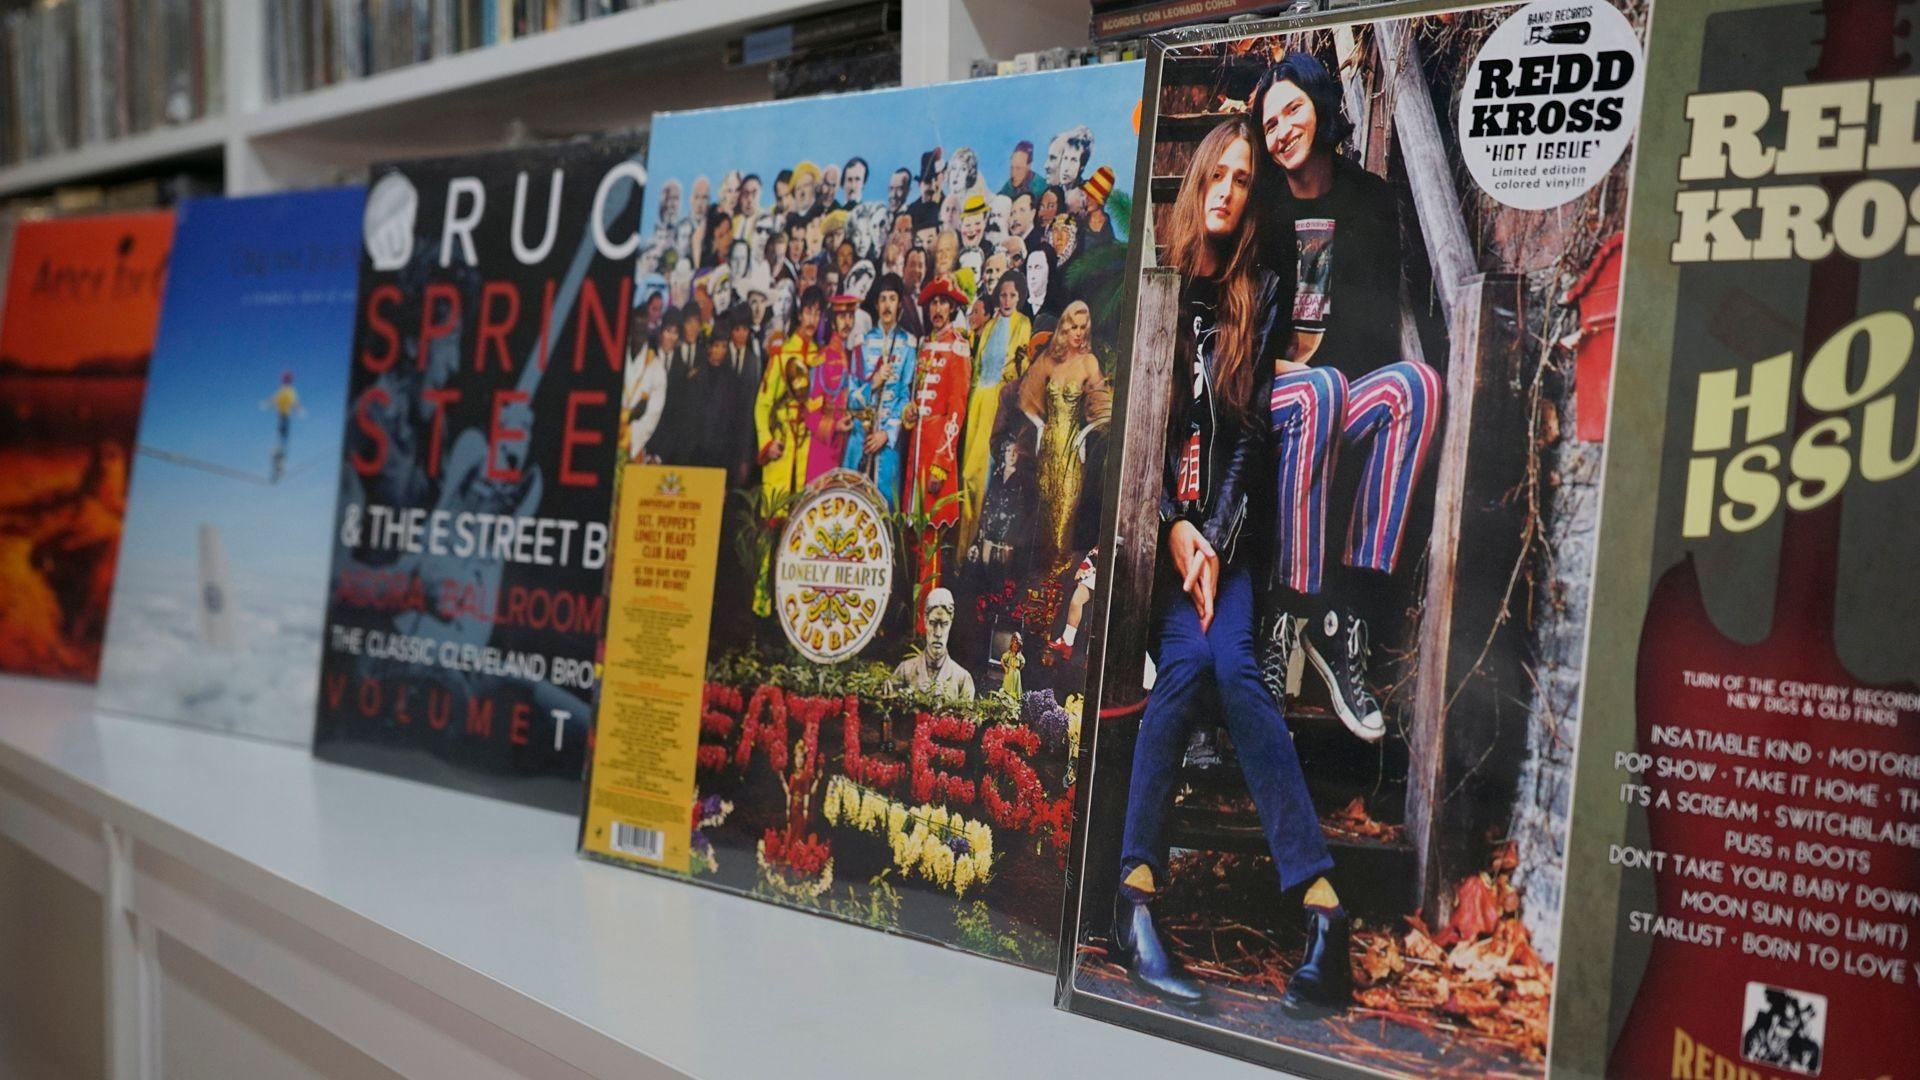 Venta de vinilos, CD, LP, DVD, camisetas o complementos